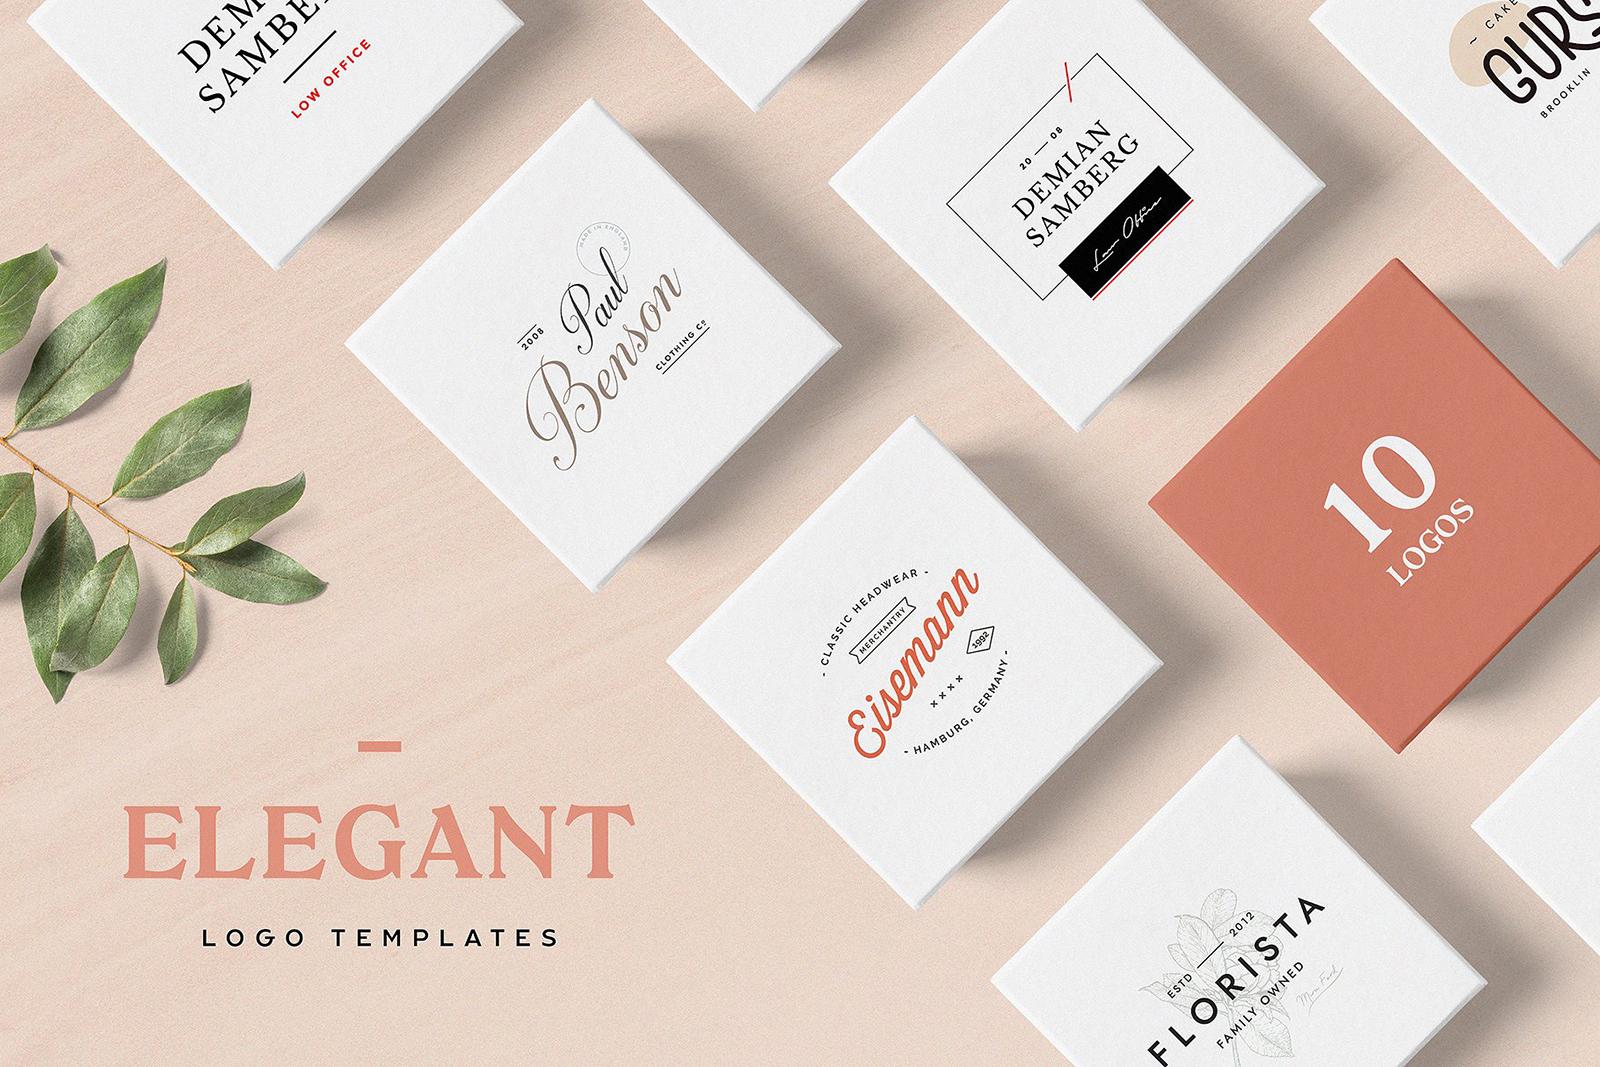 Elegant Logo Templates